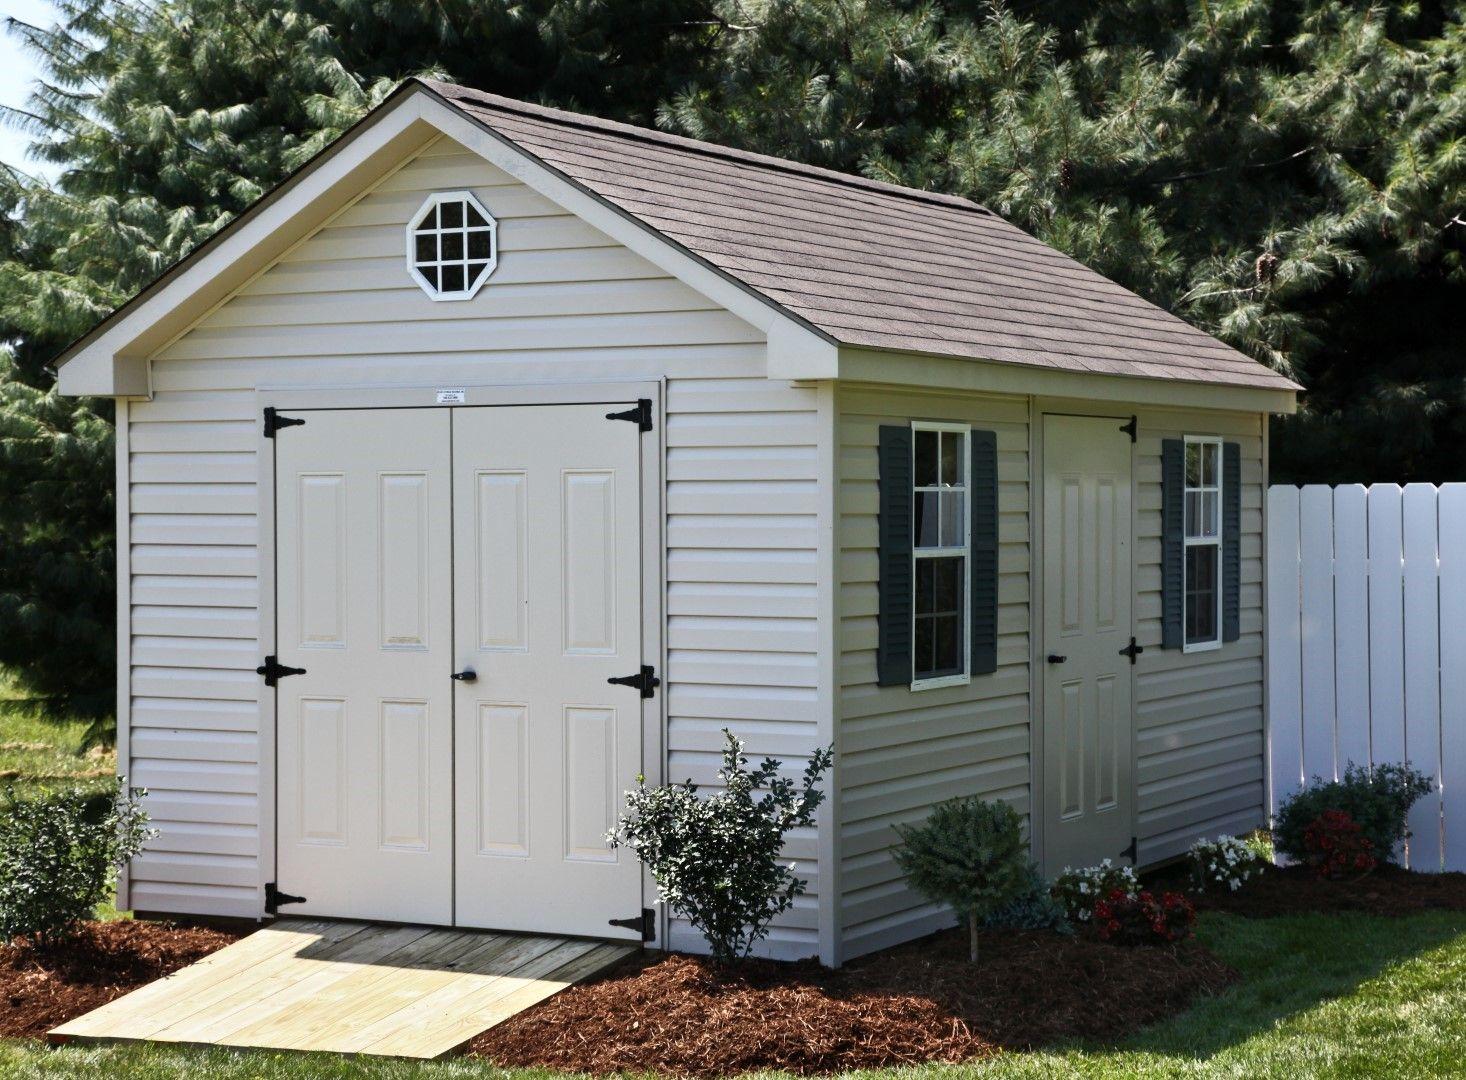 10x14 Vinyl Cottage Shingles 3 Doors Gable Roof Shed Shed Plans Diy Shed Plans Shed